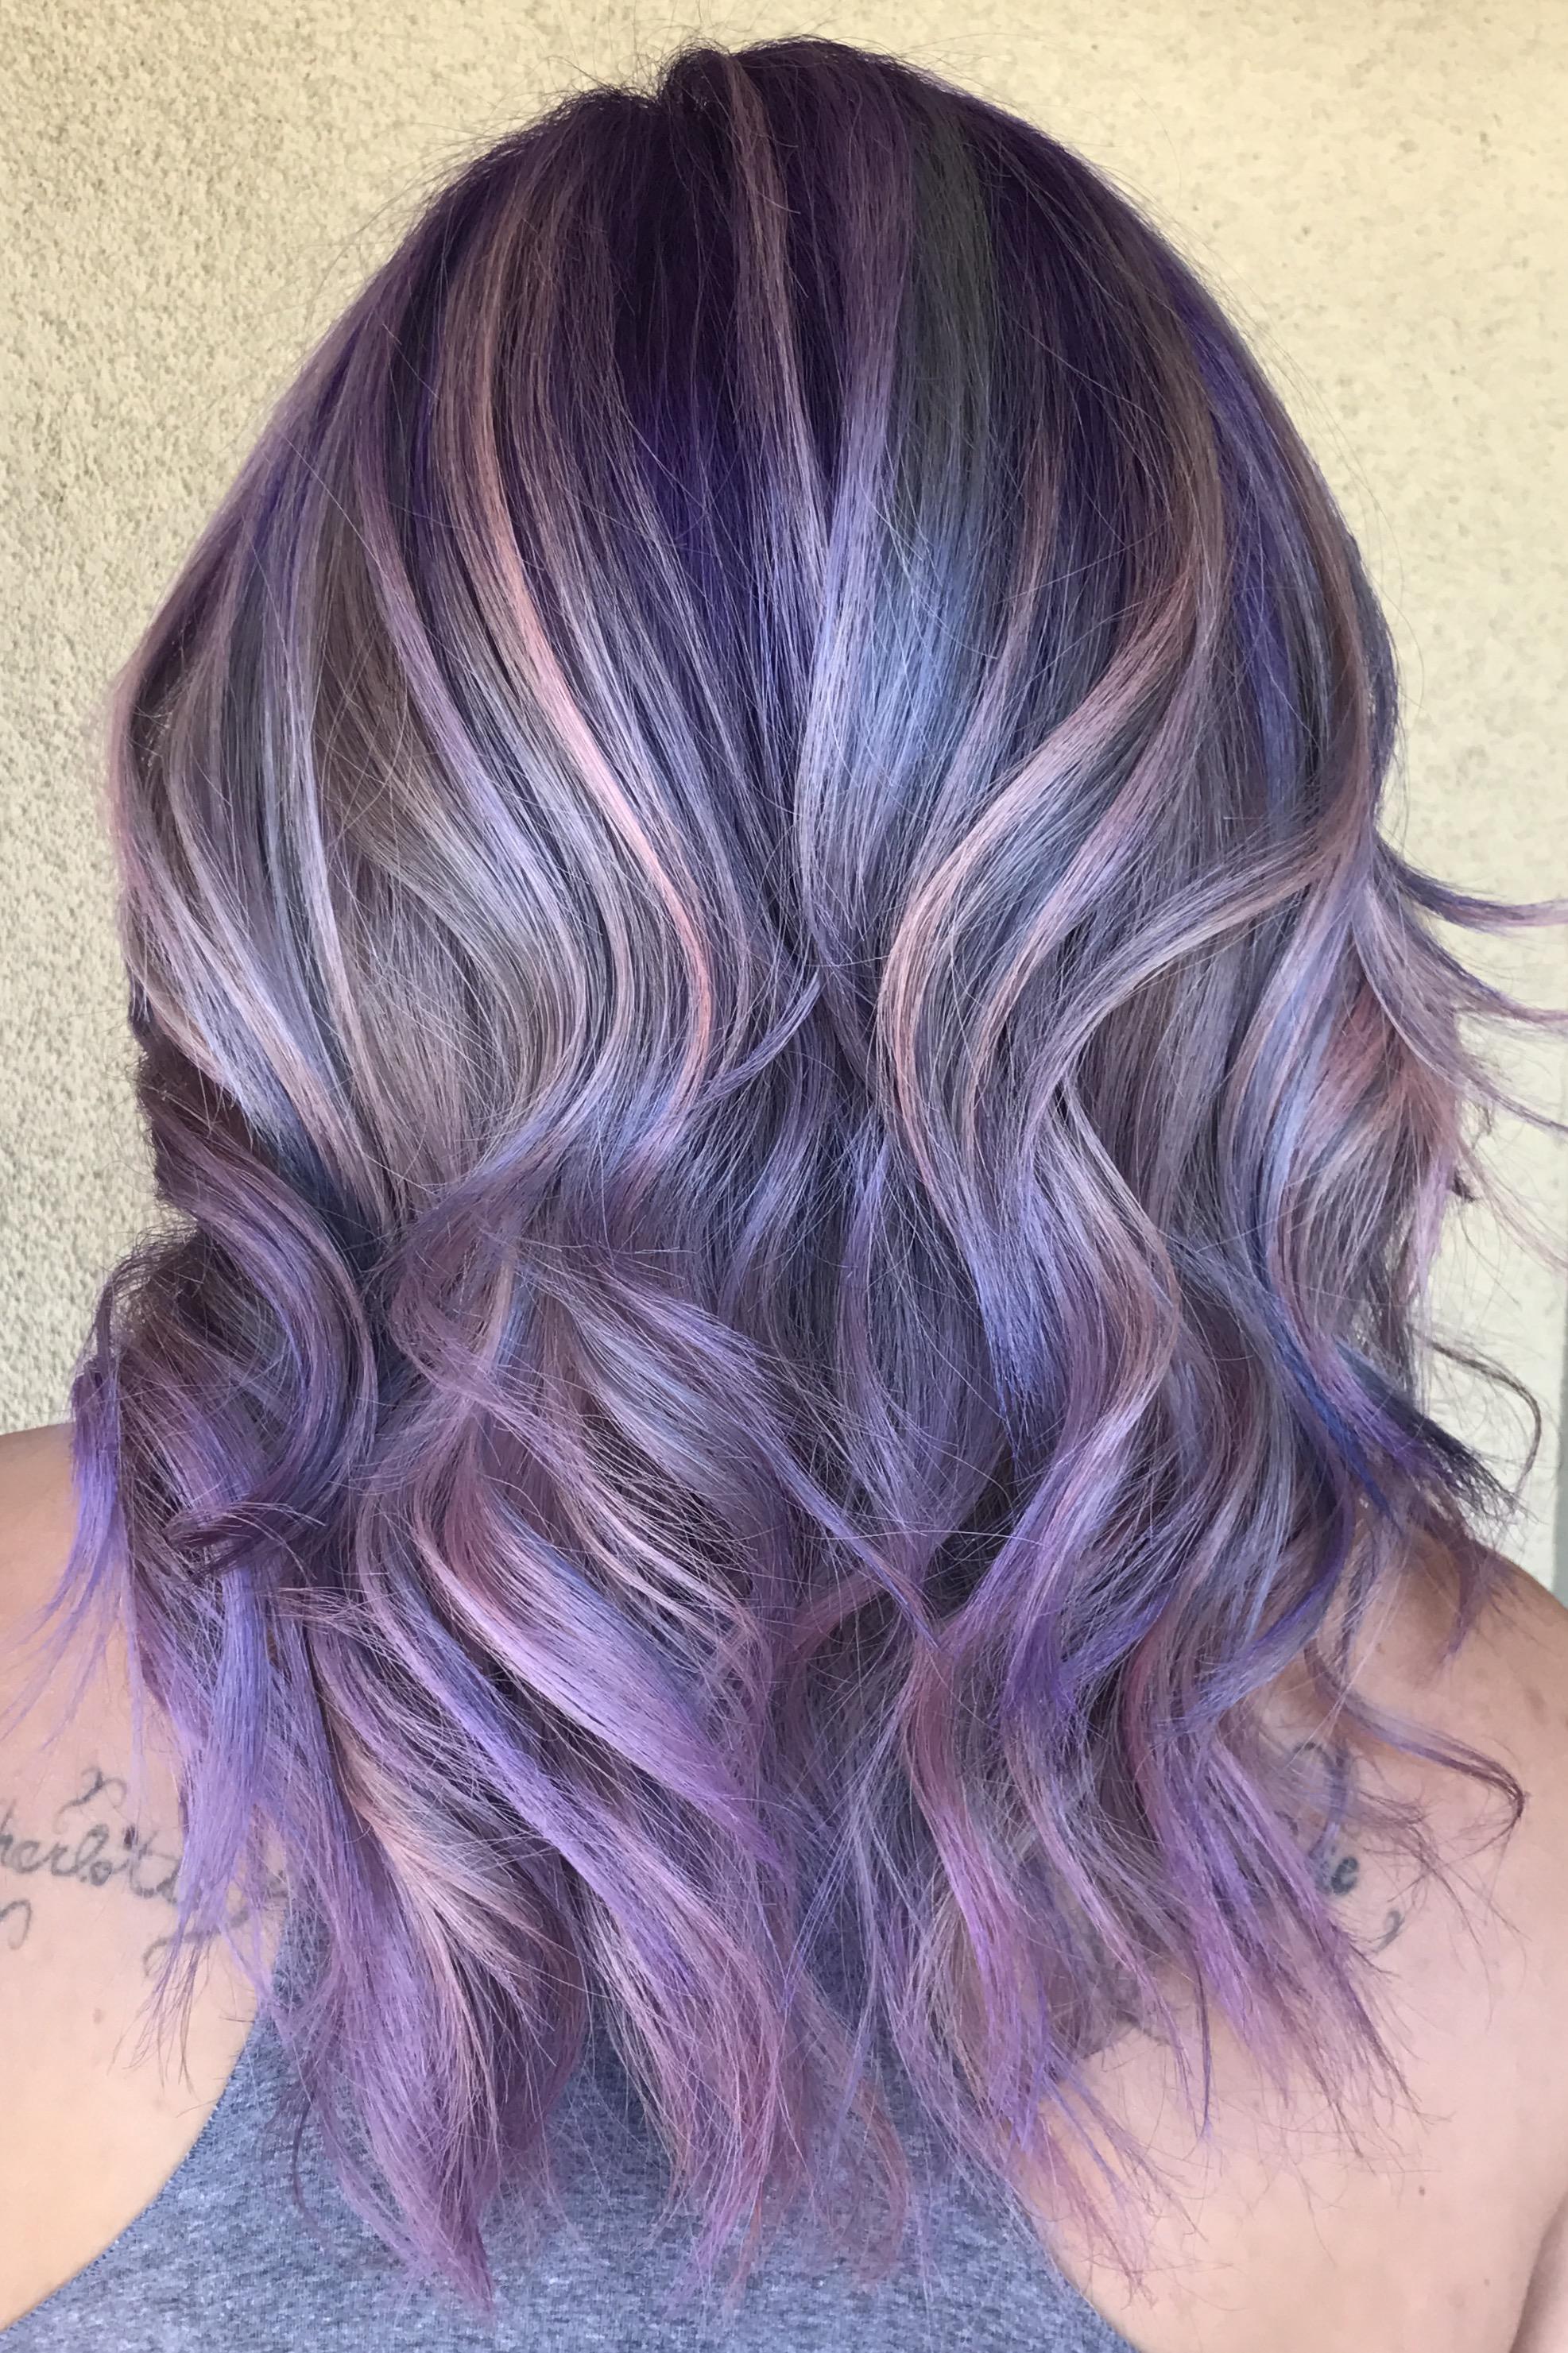 unicorn hair mermaid hair